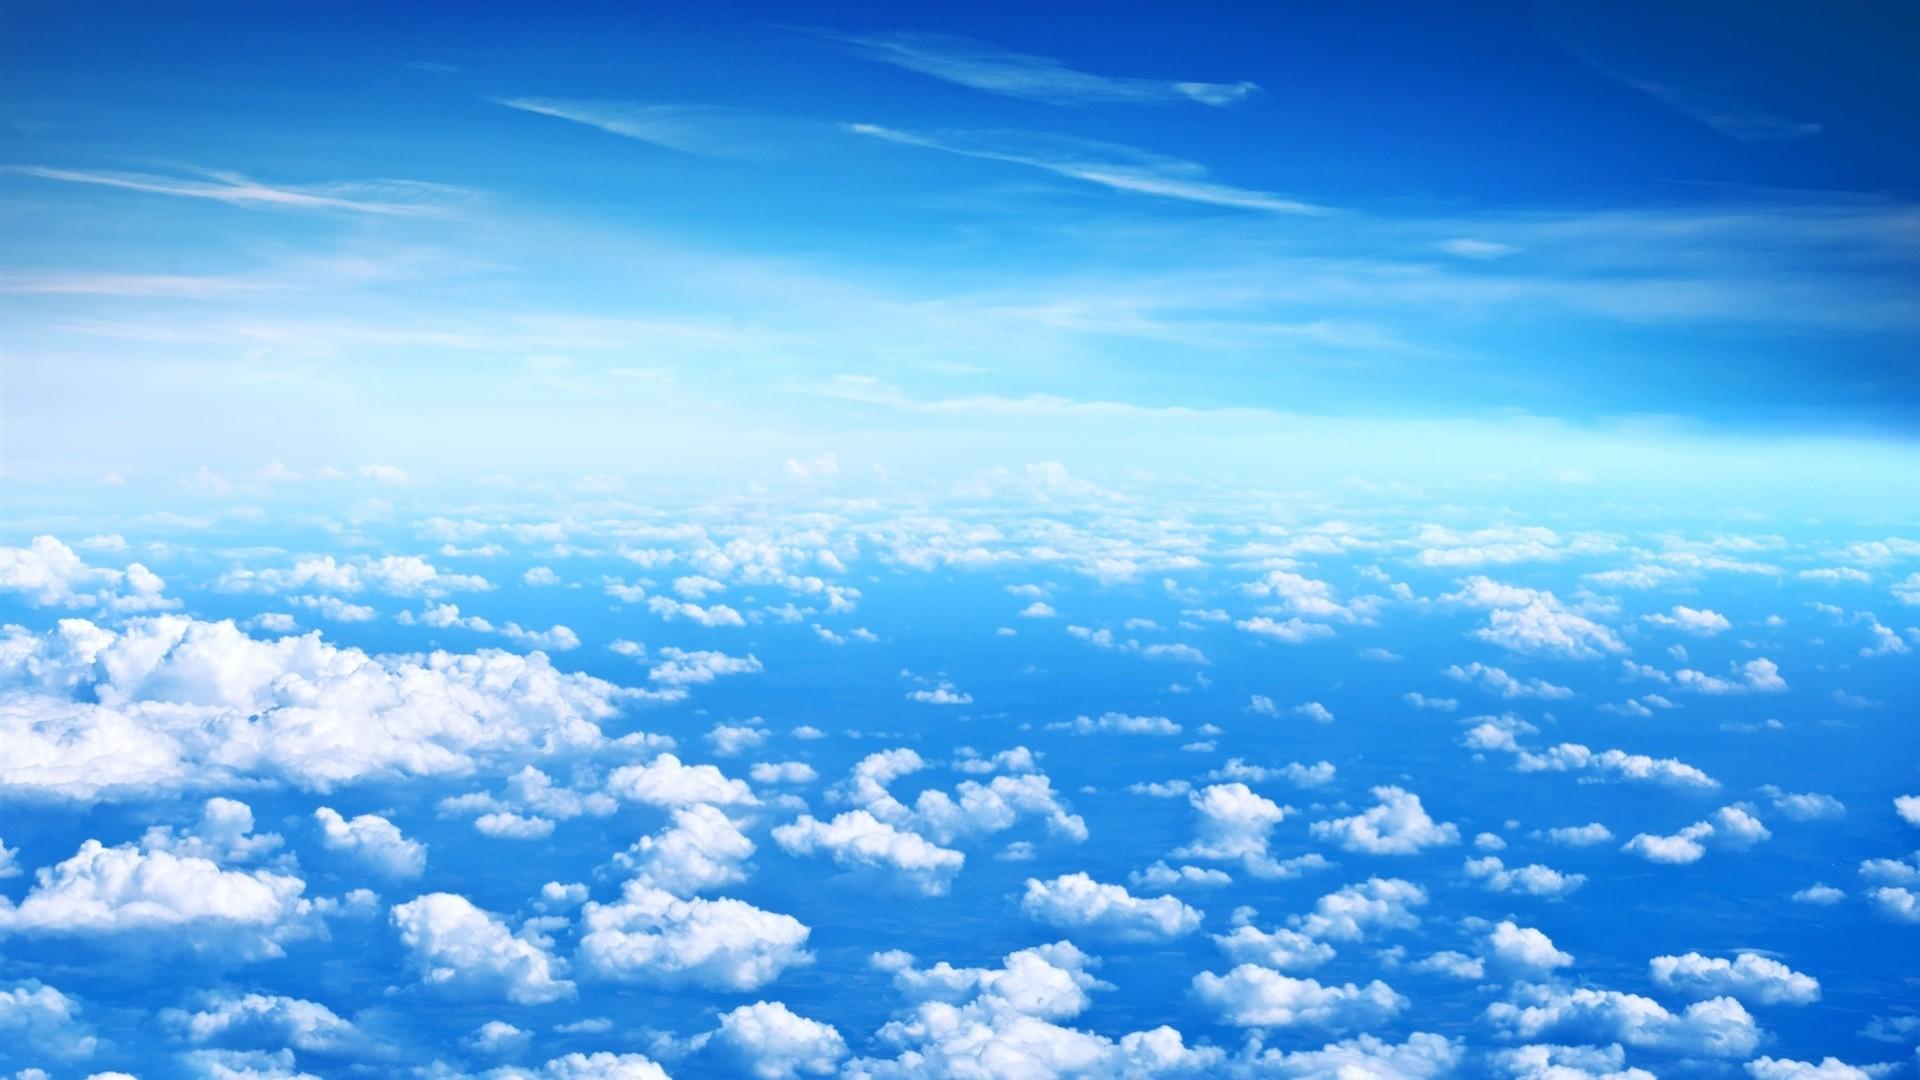 Sky Wallpaper eBay